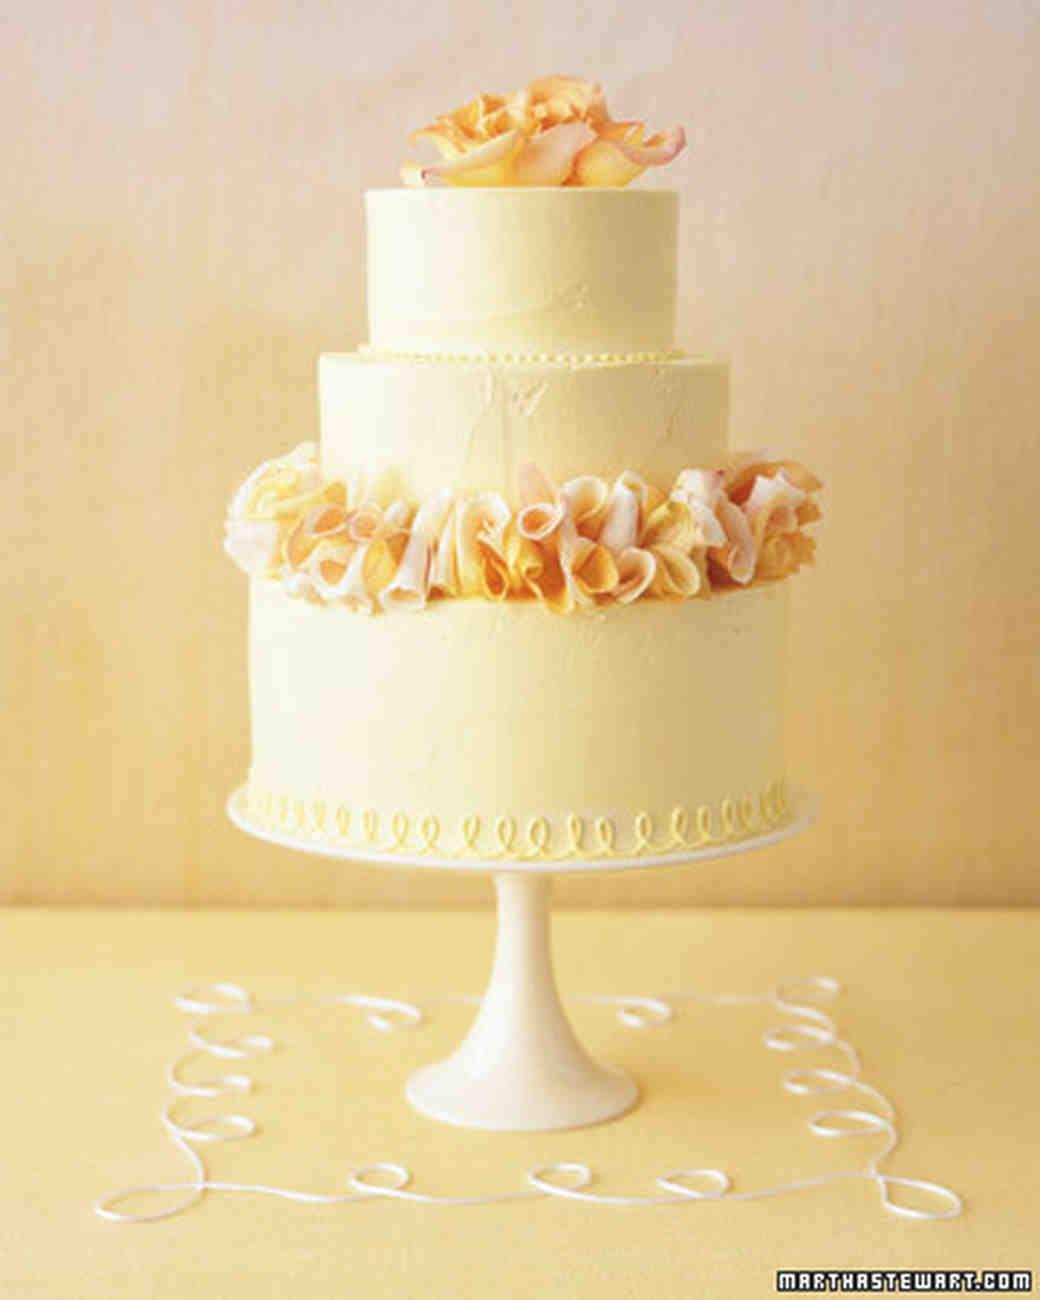 Cake funs recipes - Traditional chinese wedding cake recipes